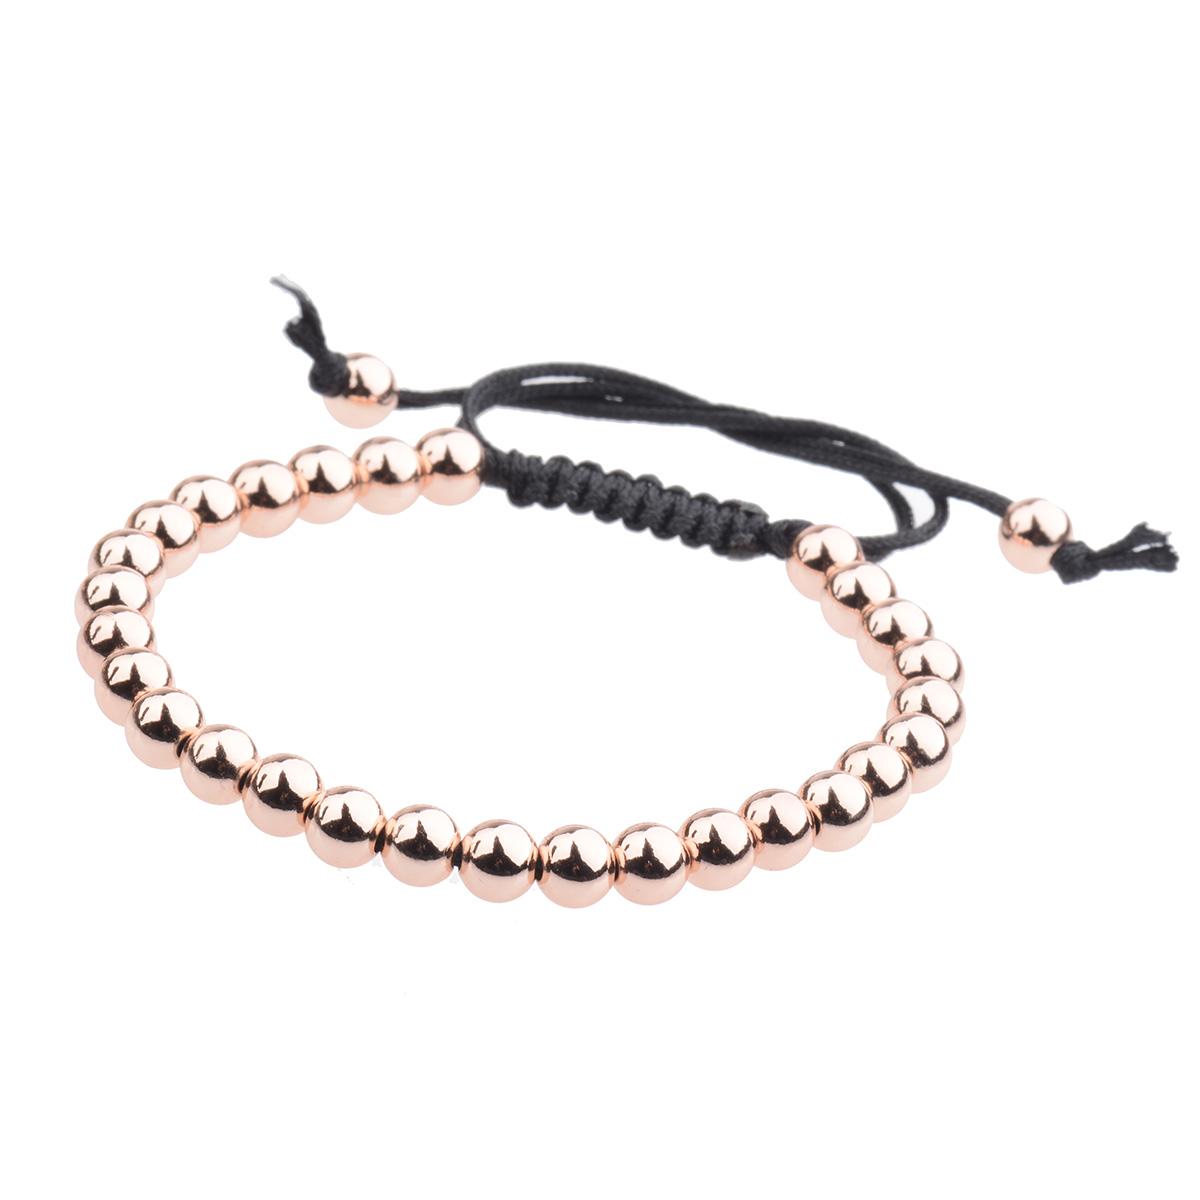 Fashion-Mens-Bracelet-24kt-Gold-Plated-Micro-Pave-Zircon-Macrame-Bracelets-6MM thumbnail 18